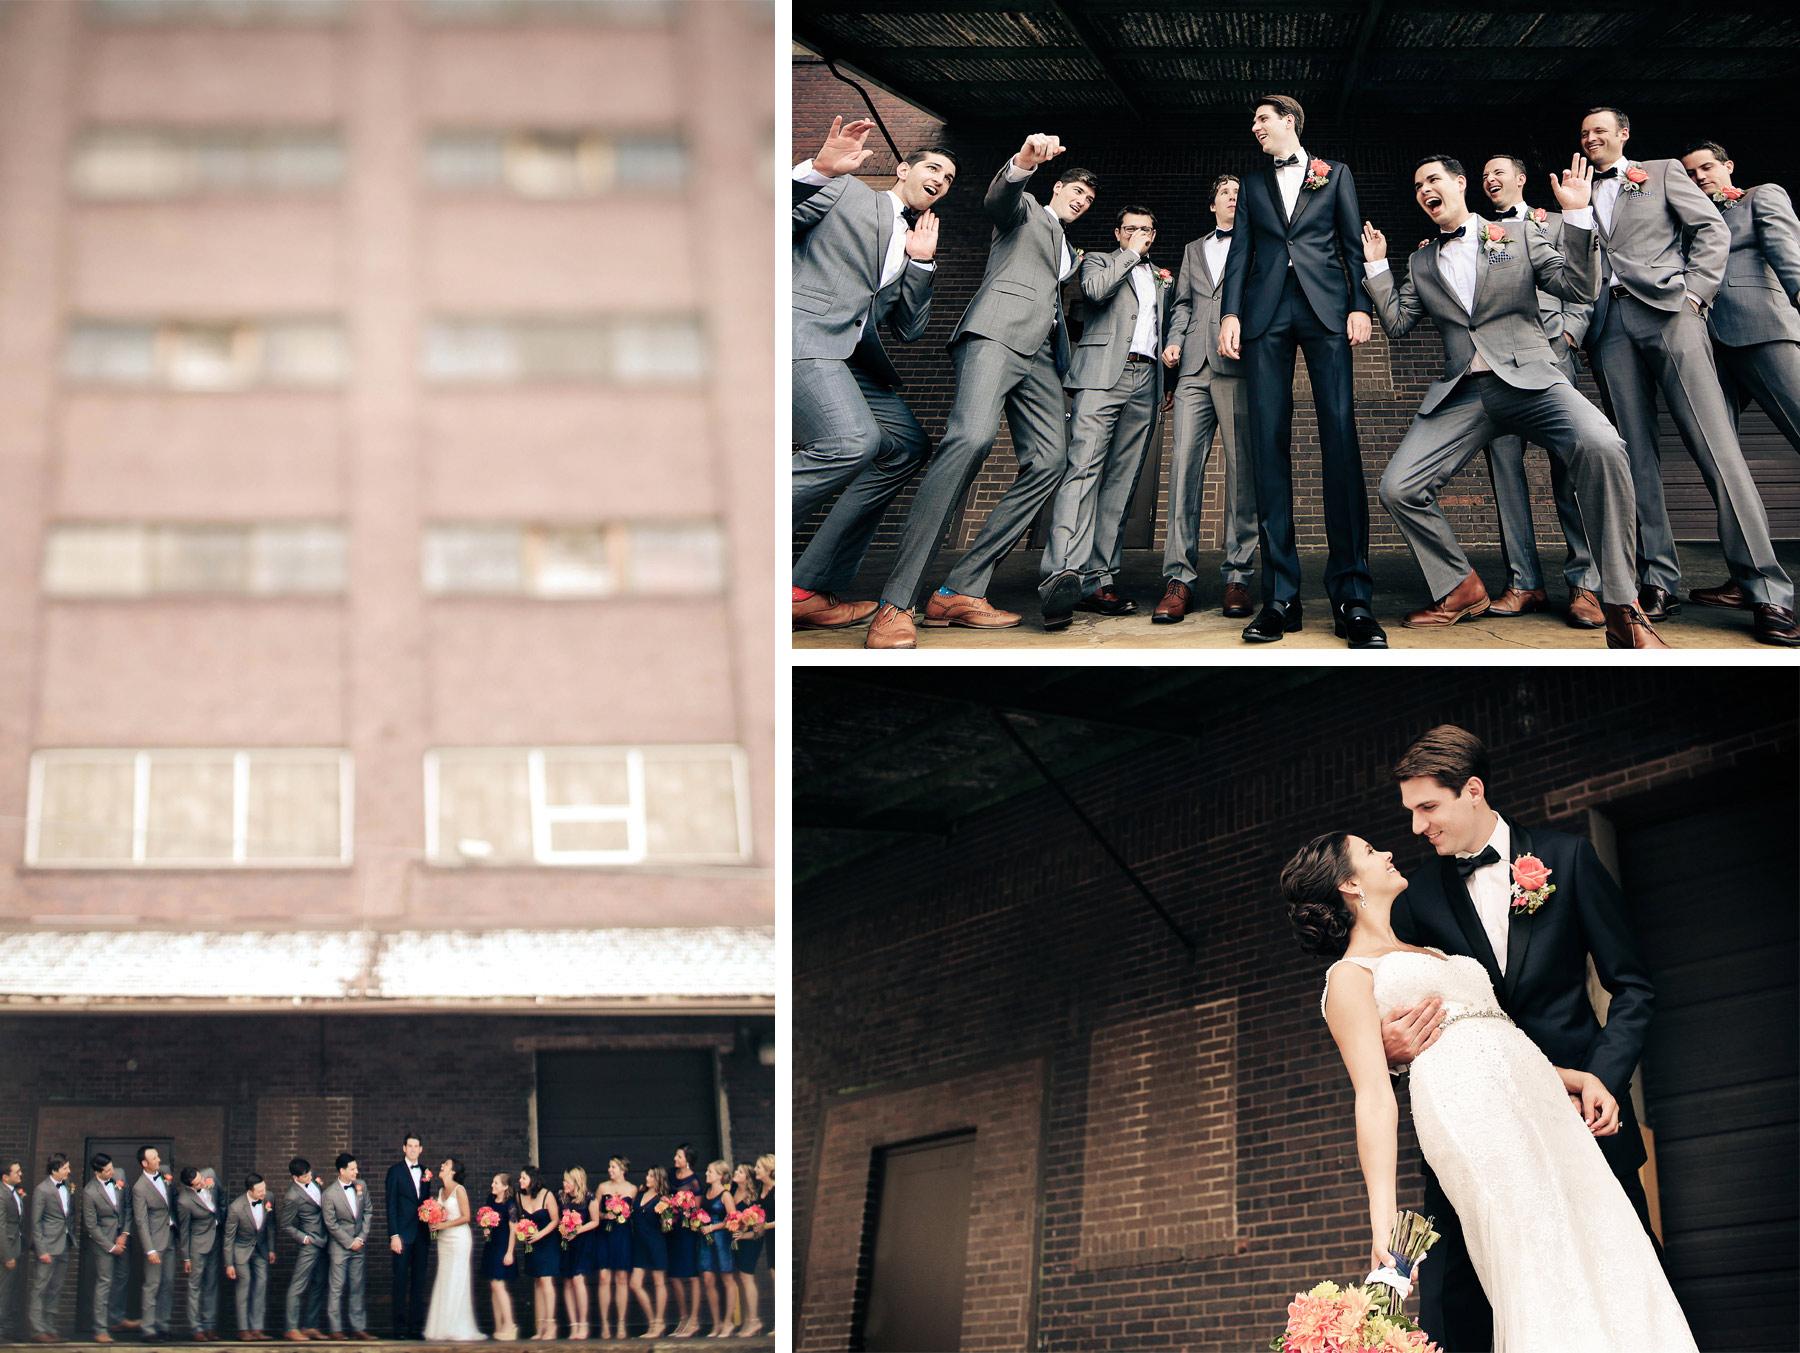 09-Minneapolis-Minnesota-Wedding-Photography-by-Vick-Photography-Wedding-Party-Group-Downtown-Lalu-&-John.jpg